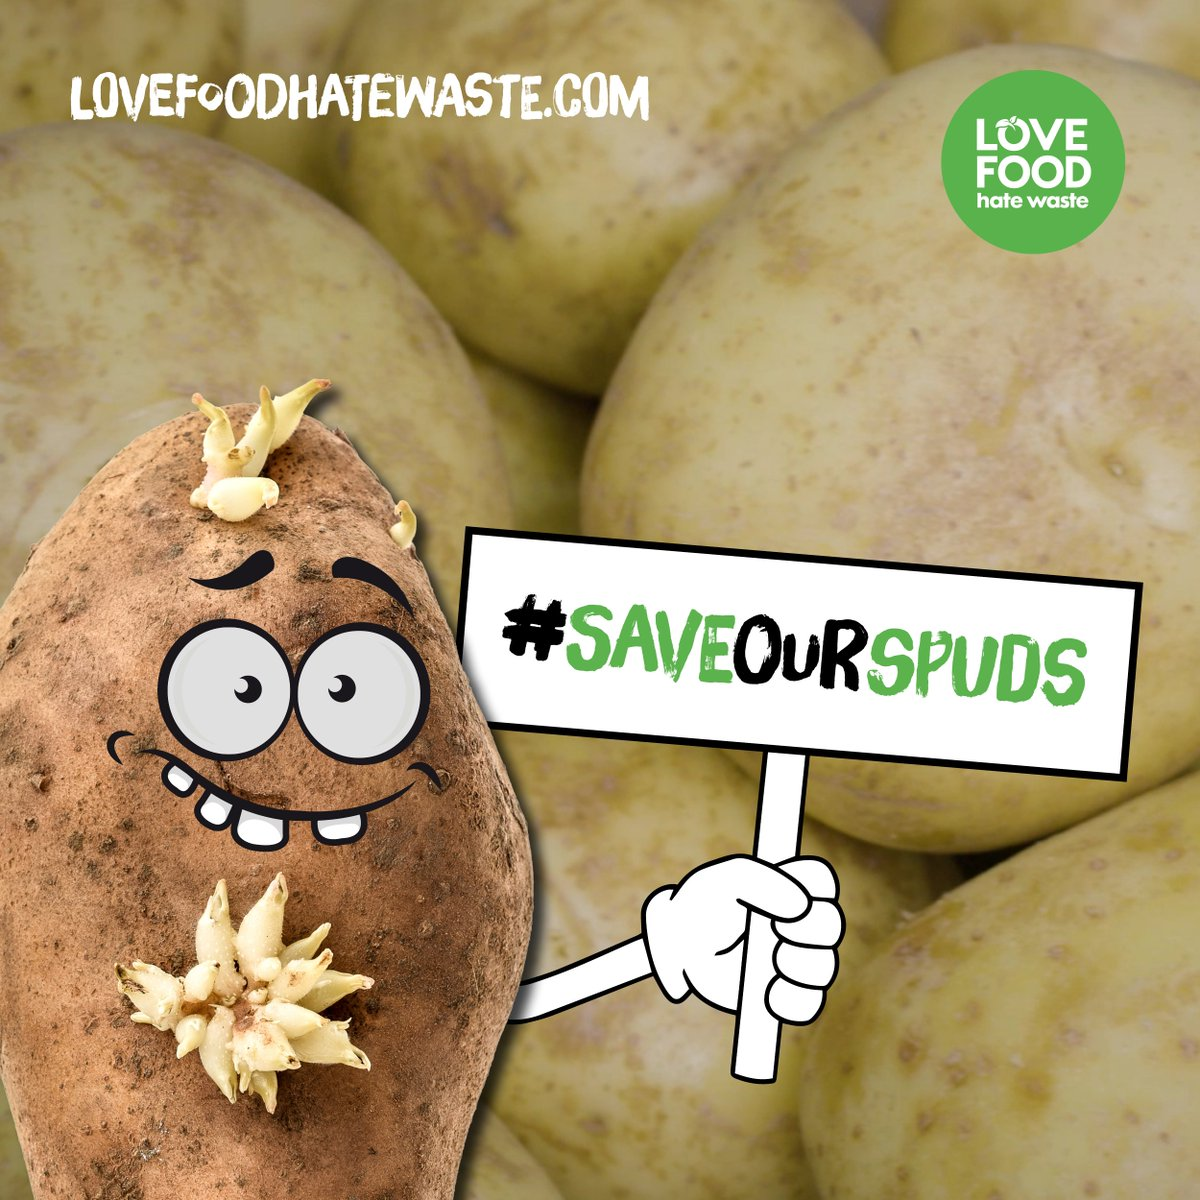 Love Food Hate Waste on Twitter: